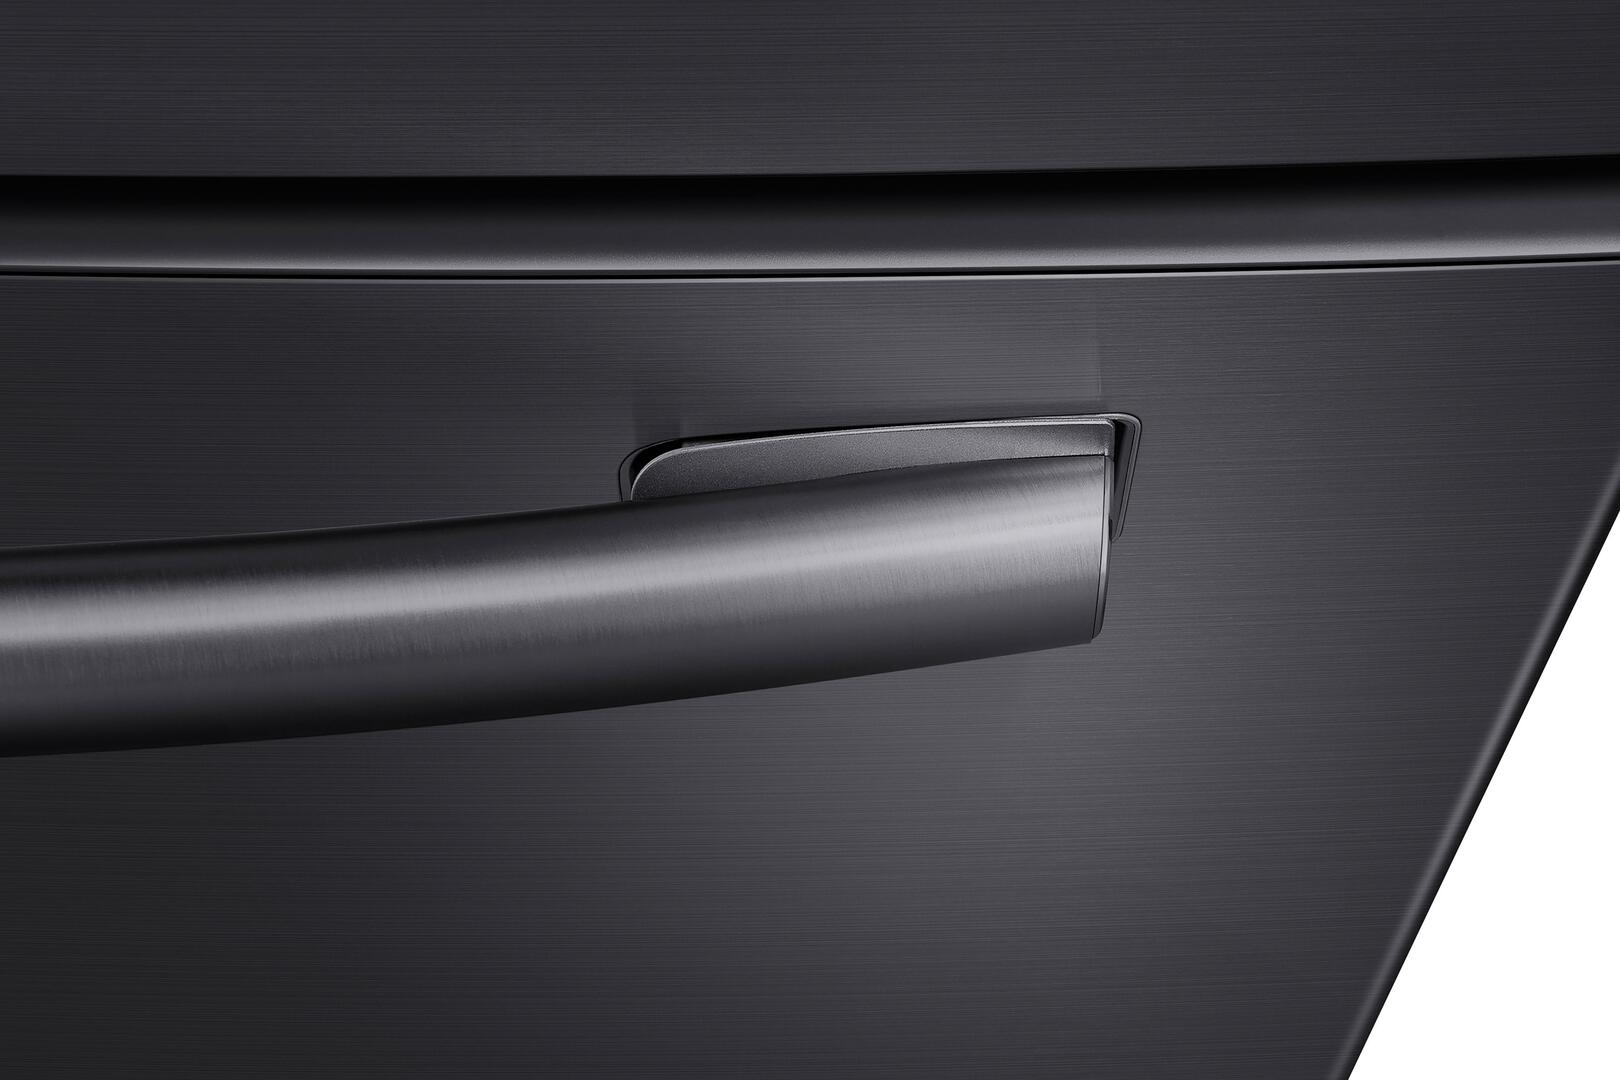 Samsung Rf261beaesg 36 Inch Black Stainless Steel Series